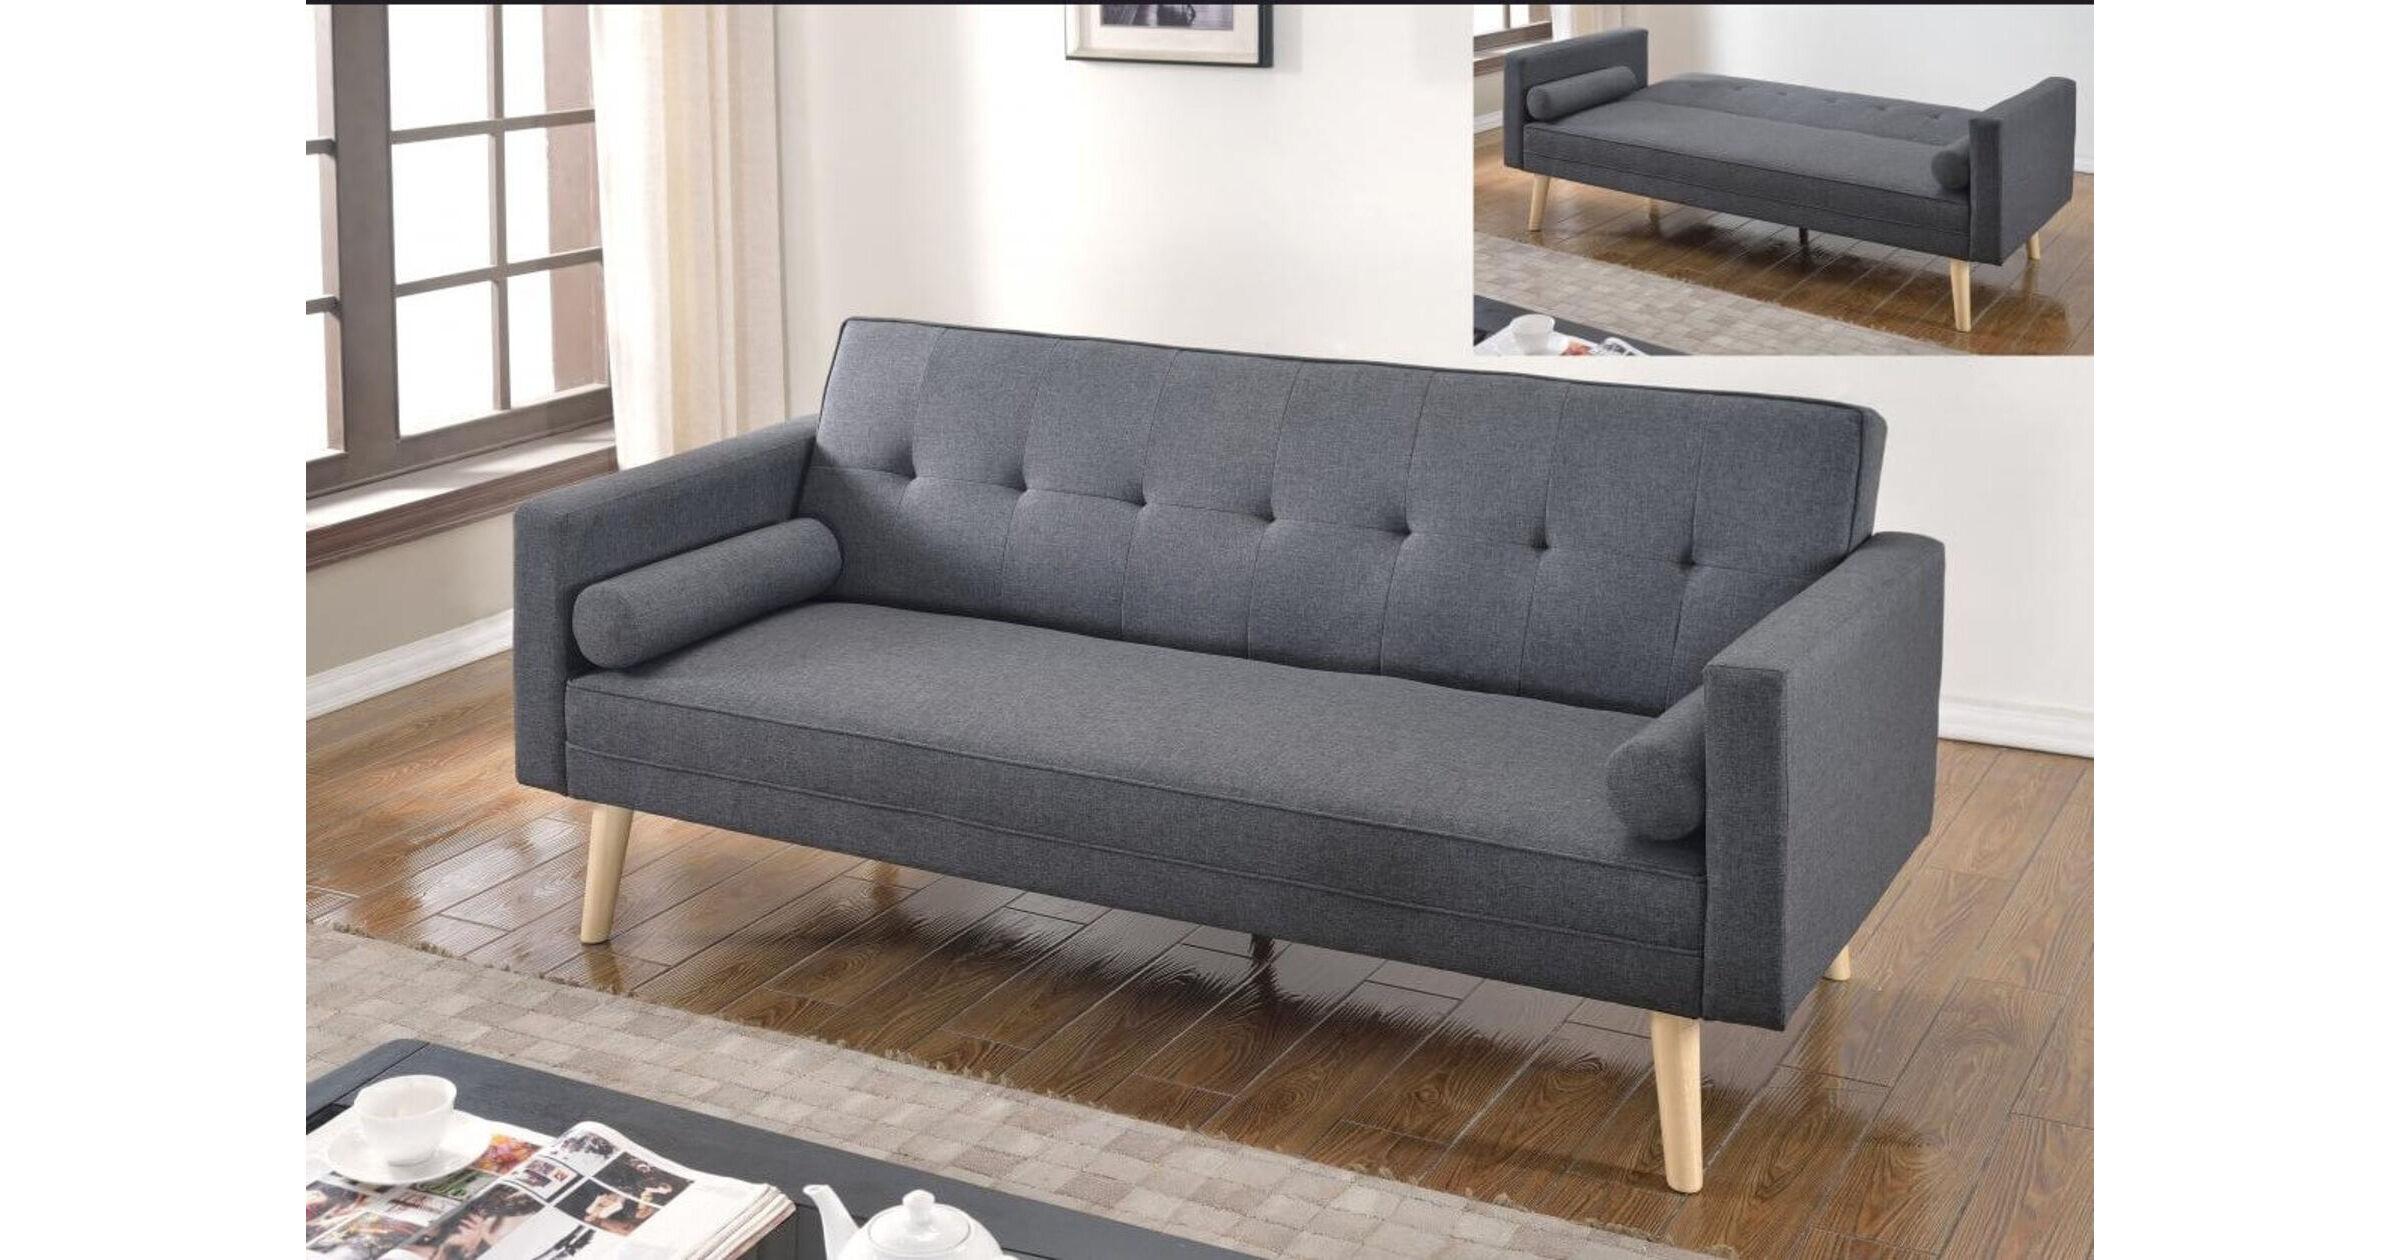 paris linen sofa bed dark grey rh designersofas4u co uk grey sofa beds for sale grey sofa beds uk